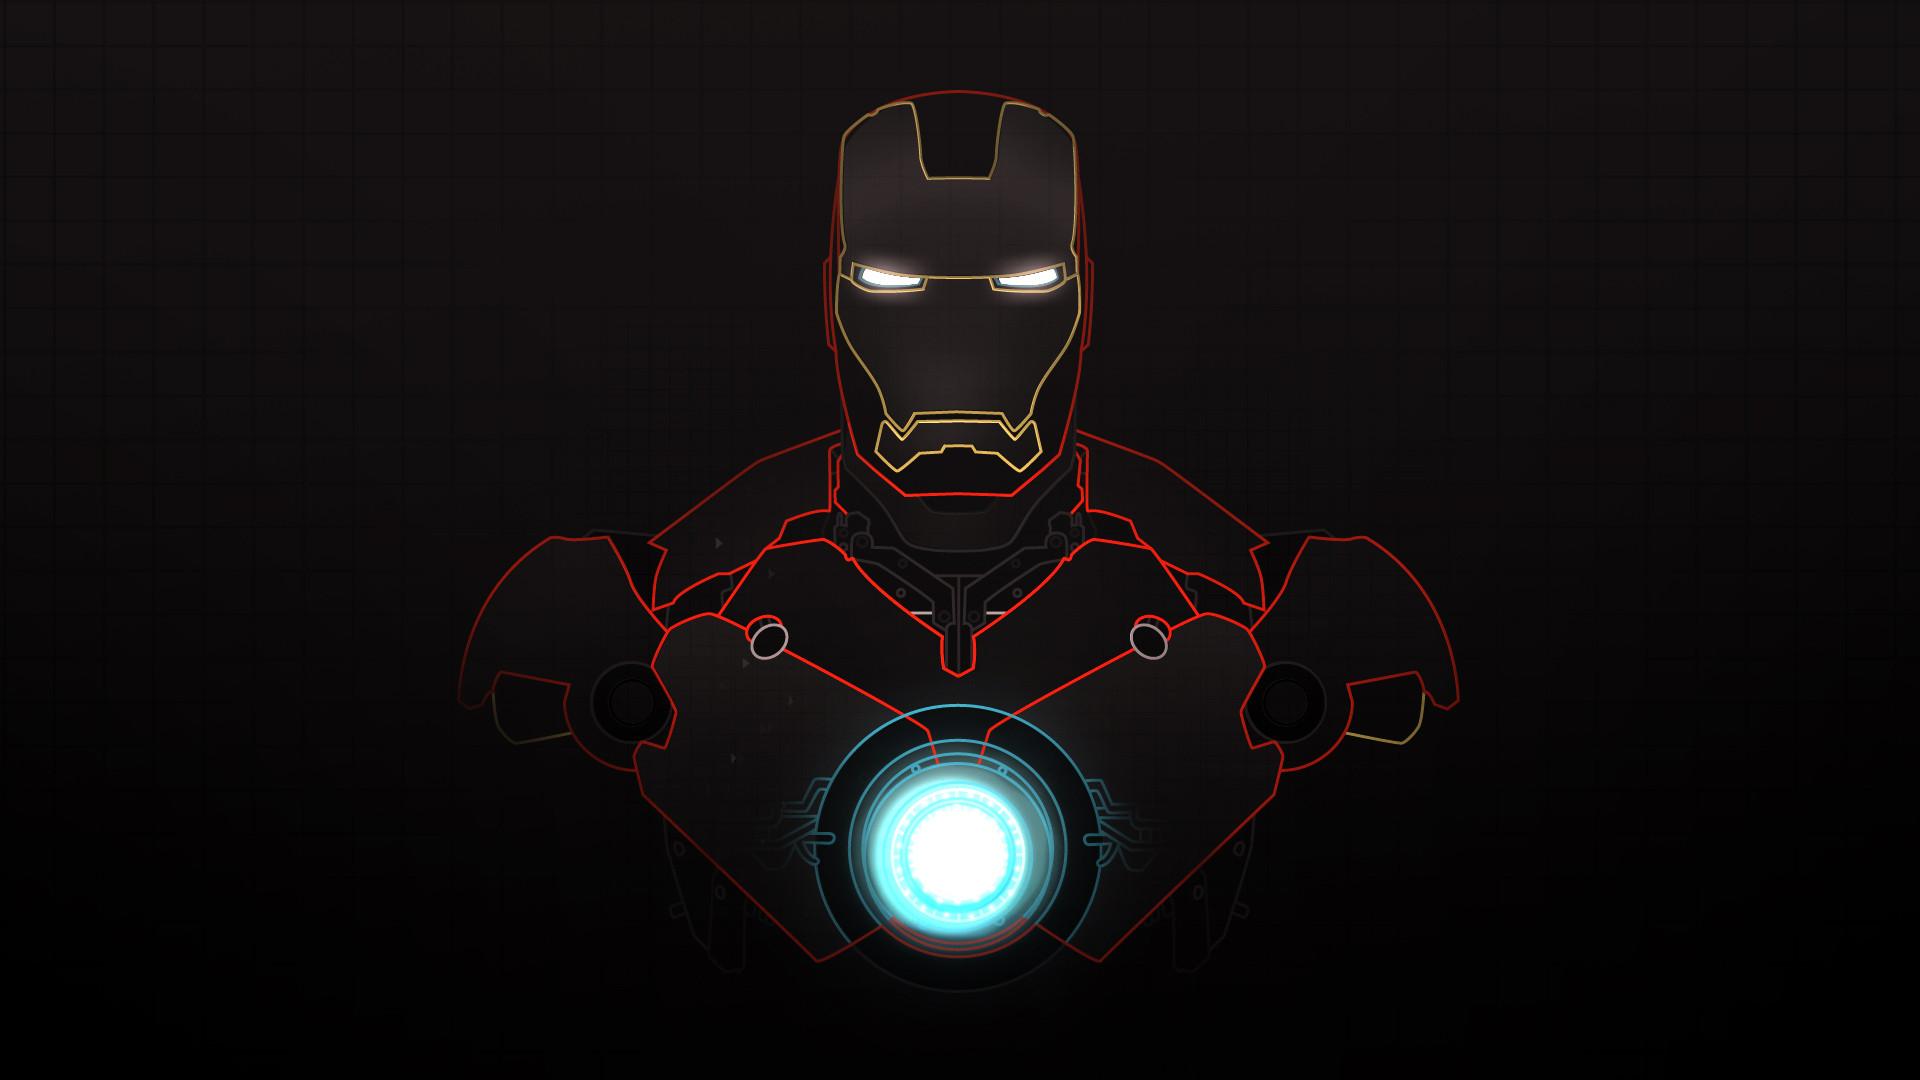 49 Iron Man Wallpaper For Android On Wallpapersafari